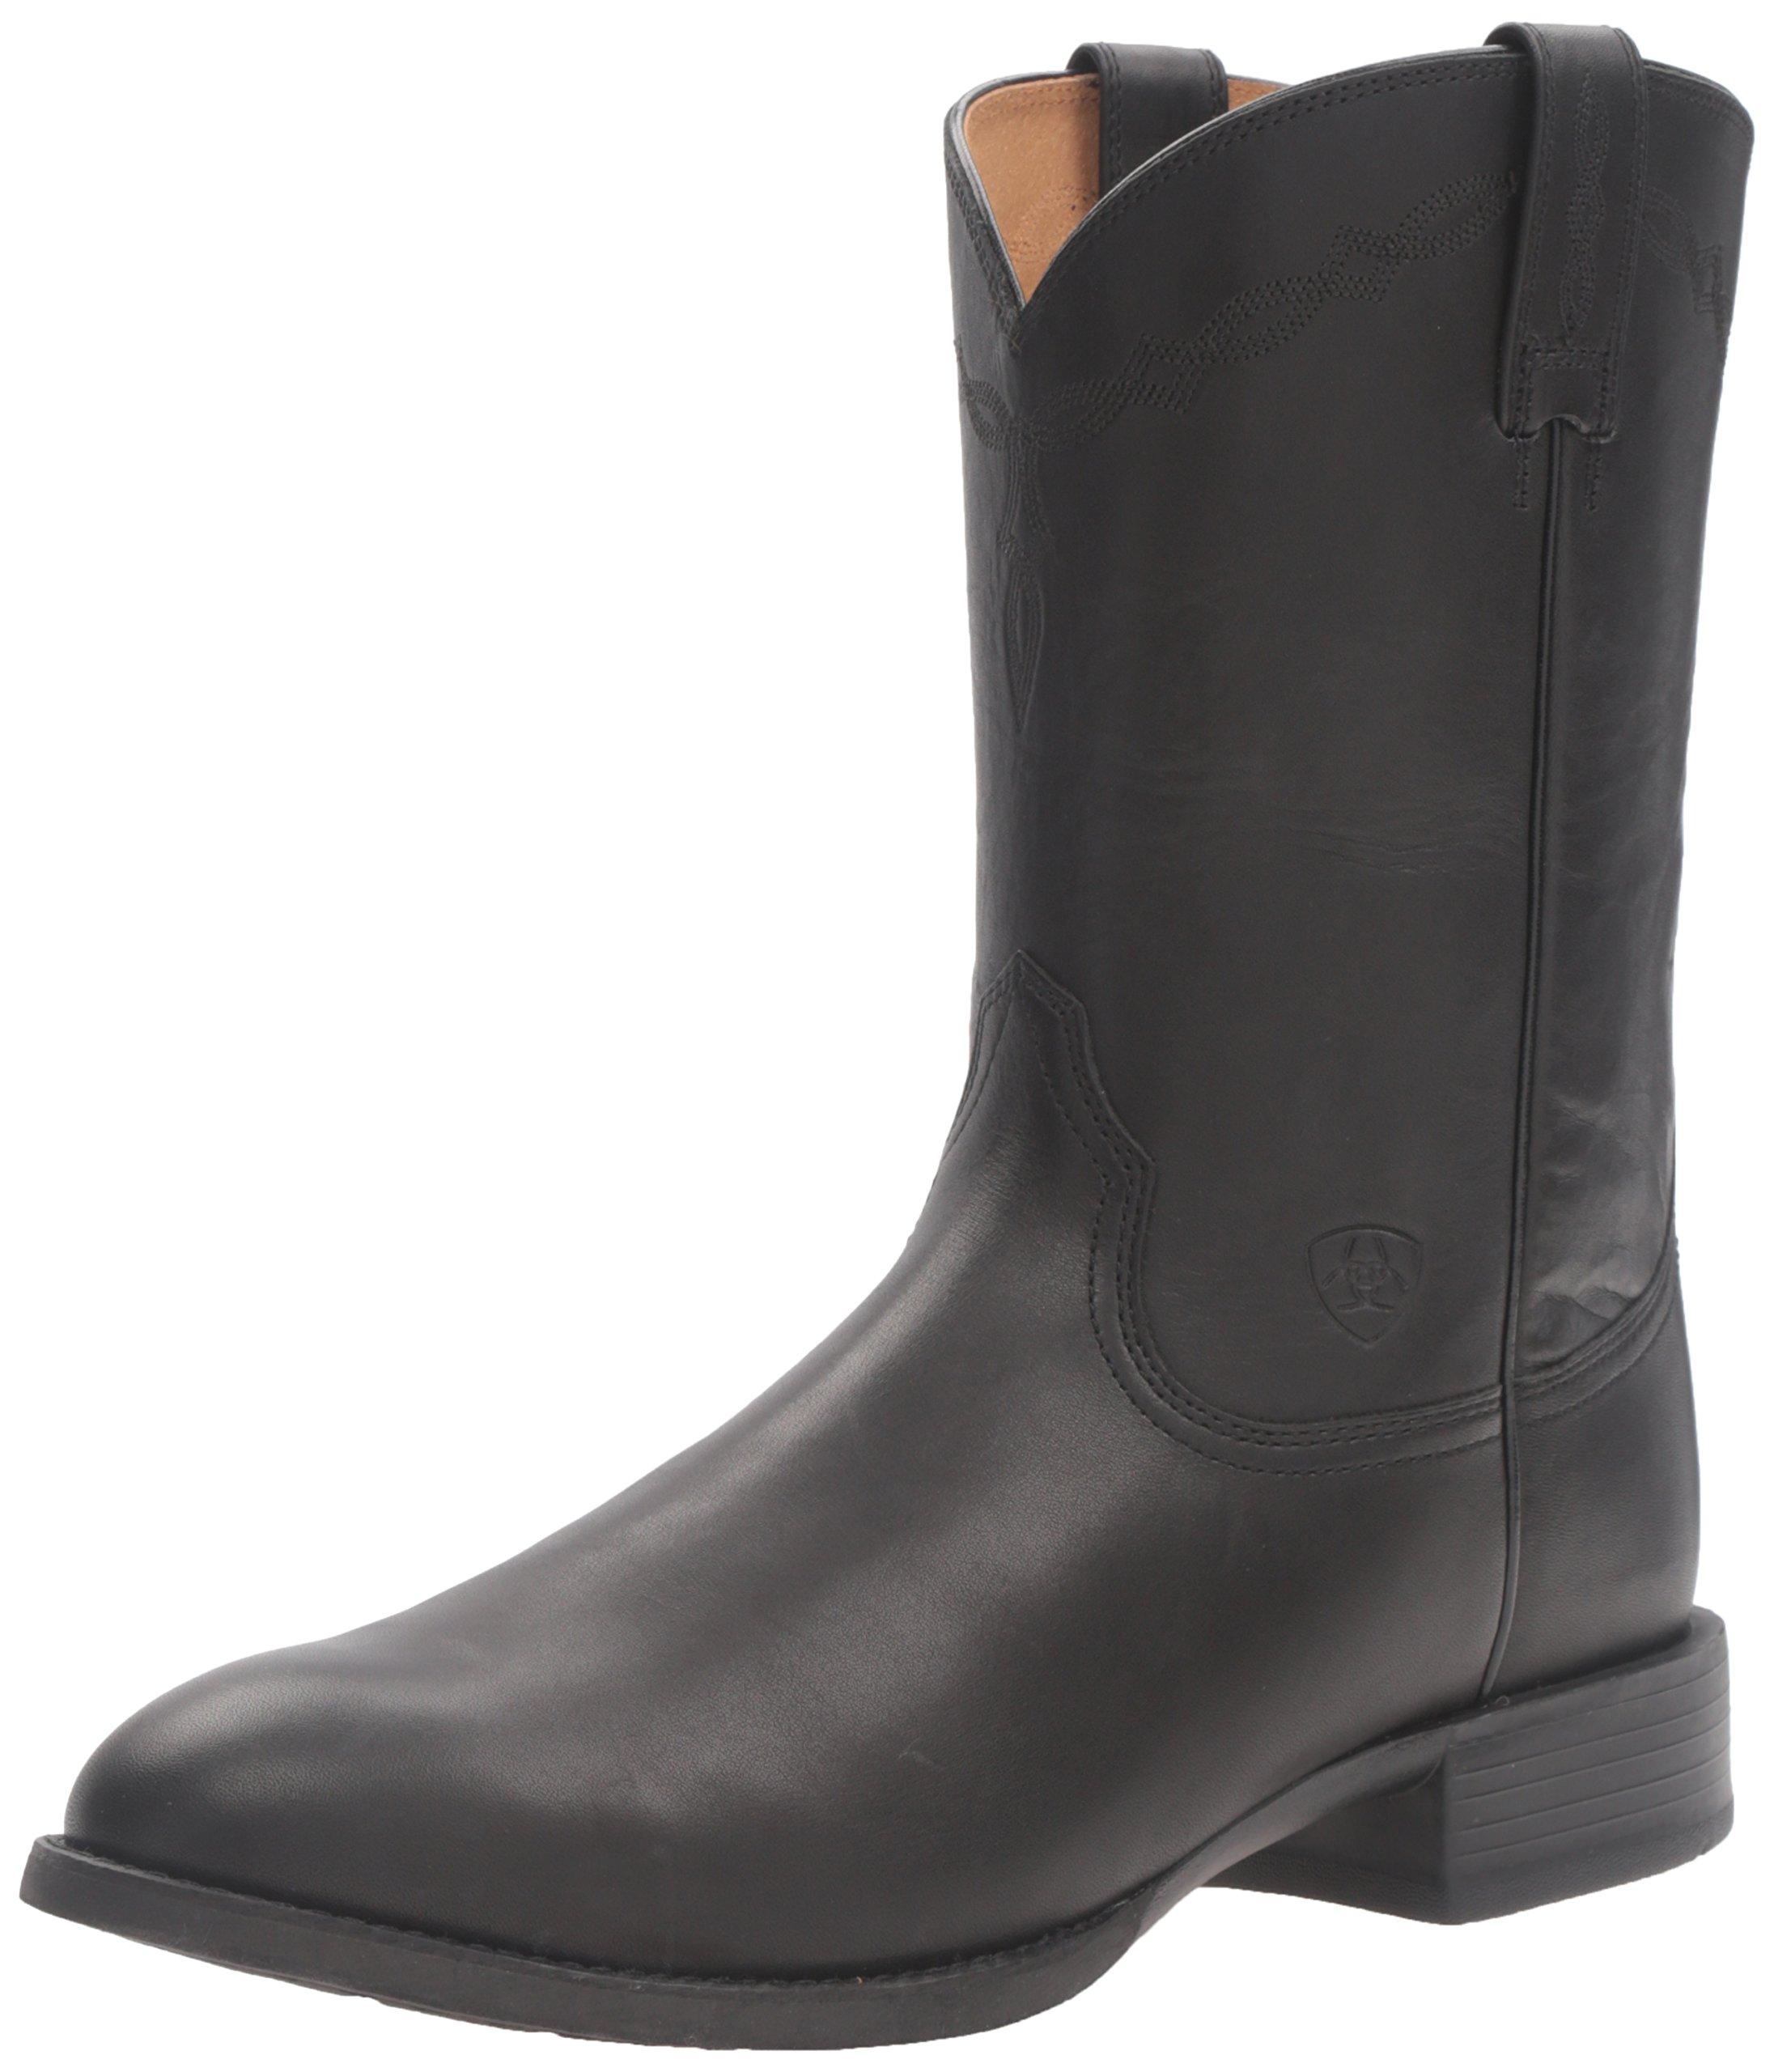 Ariat Women's Heritage Roper Western Cowboy Boot, Black, 7.5 C US